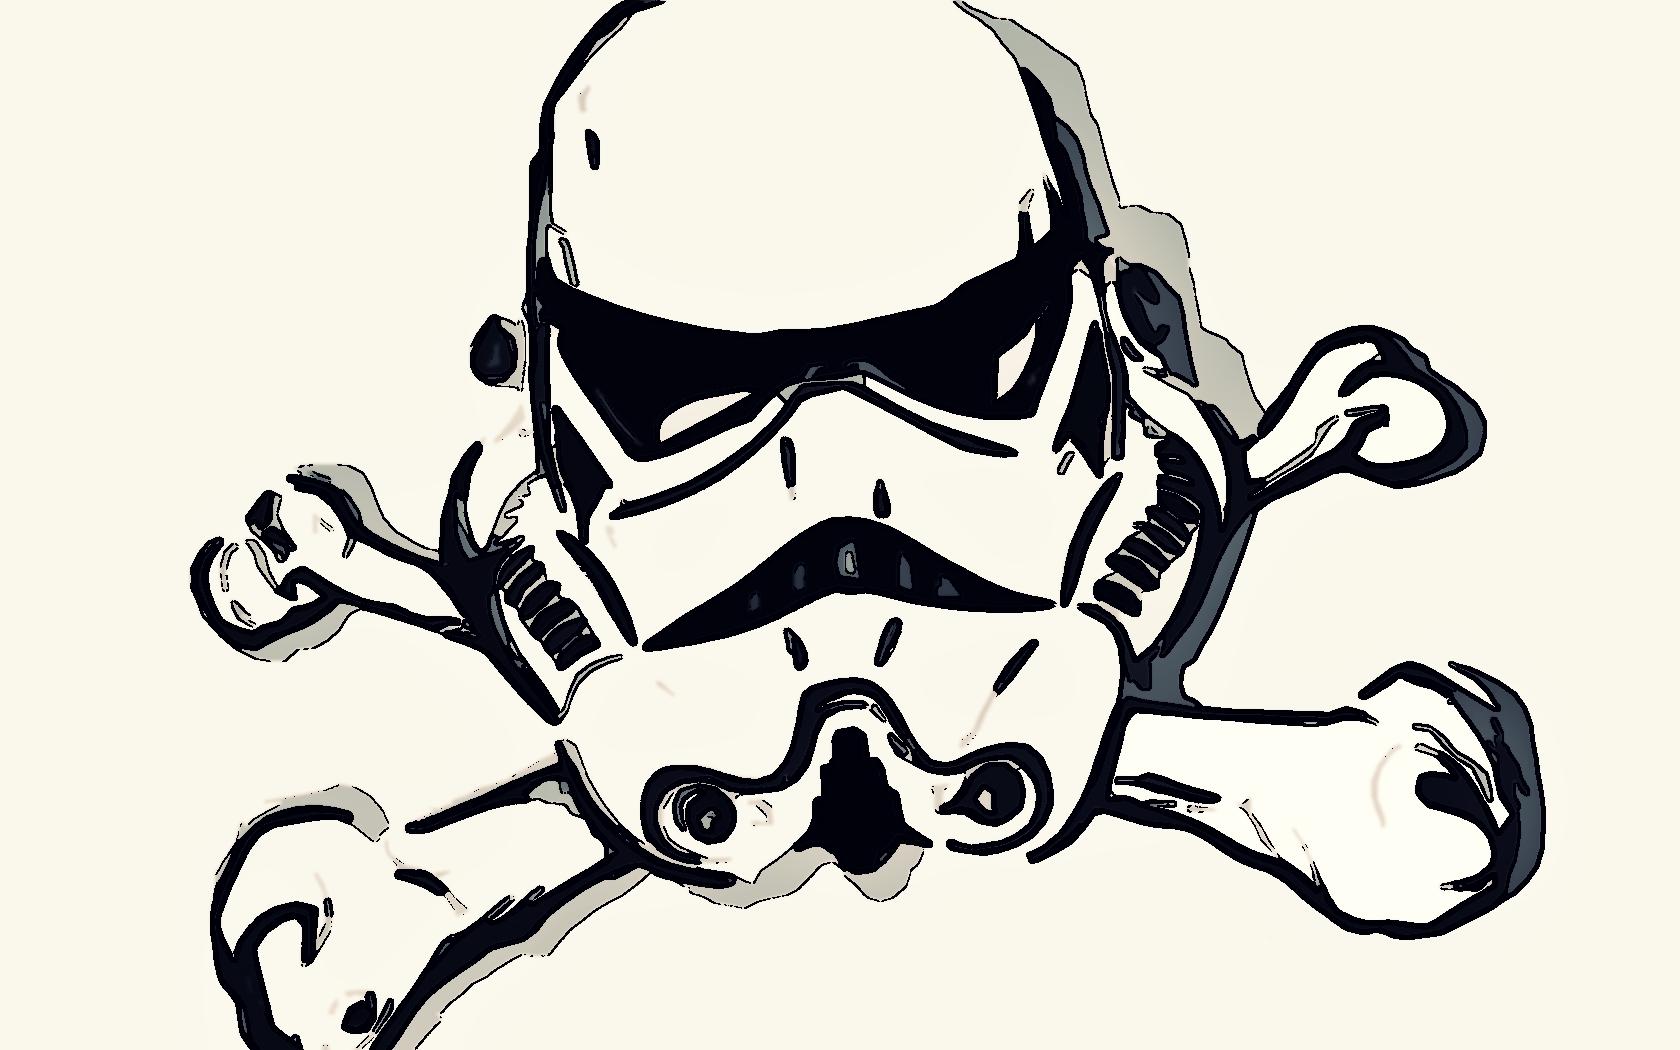 star wars stormtroopers skull and crossbones 940188 1680x1050